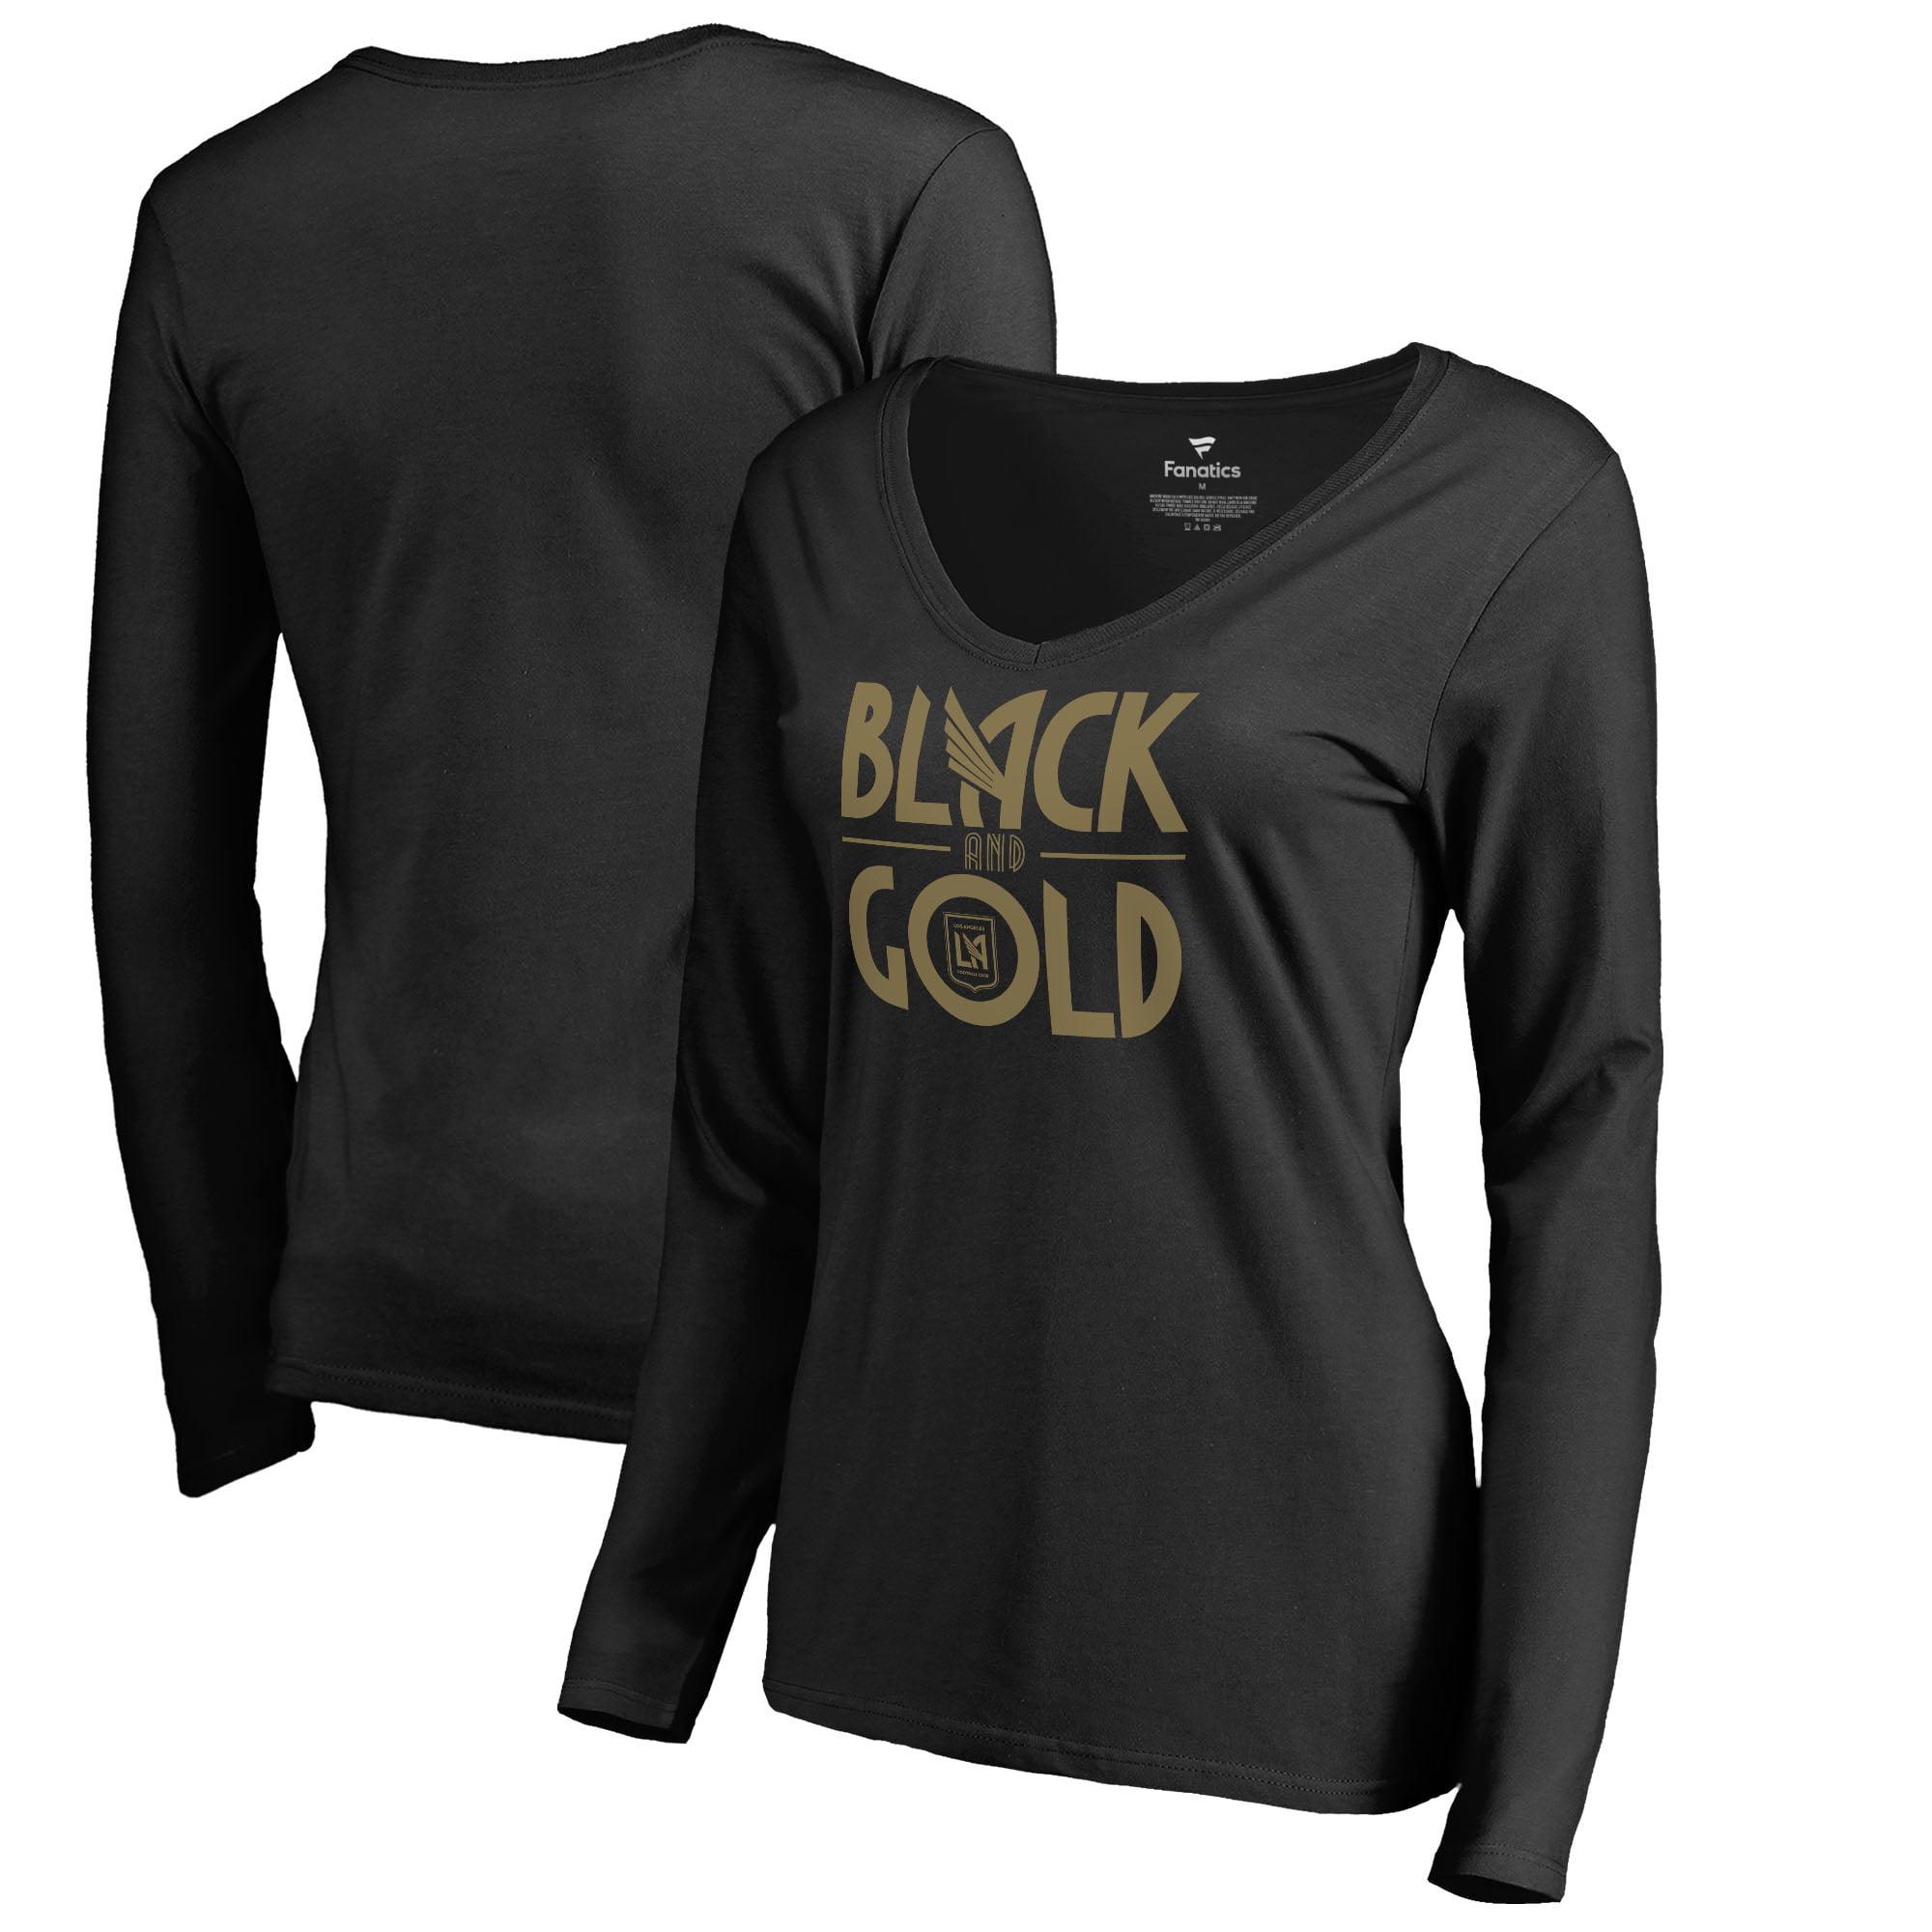 LAFC Fanatics Branded Women's Hometown Collection Black & Gold Long Sleeve V-Neck T-Shirt - Black